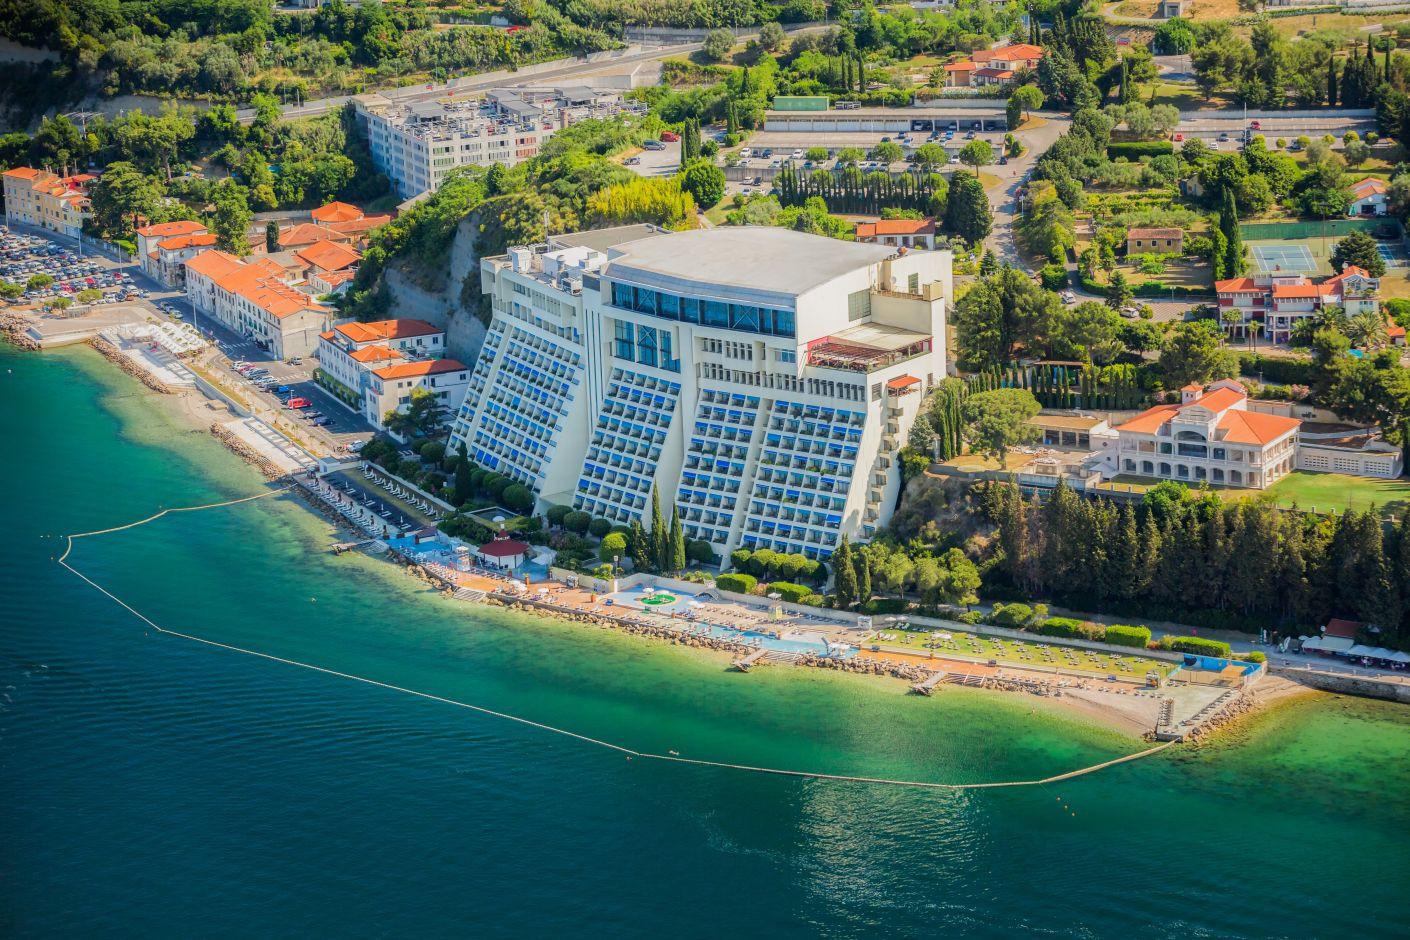 The stunning Grand Hotel Bernadin on the Istrian sea in Portorož will host the FIS Calendar Conference in 2021 ©Grand Hotel Bernadin